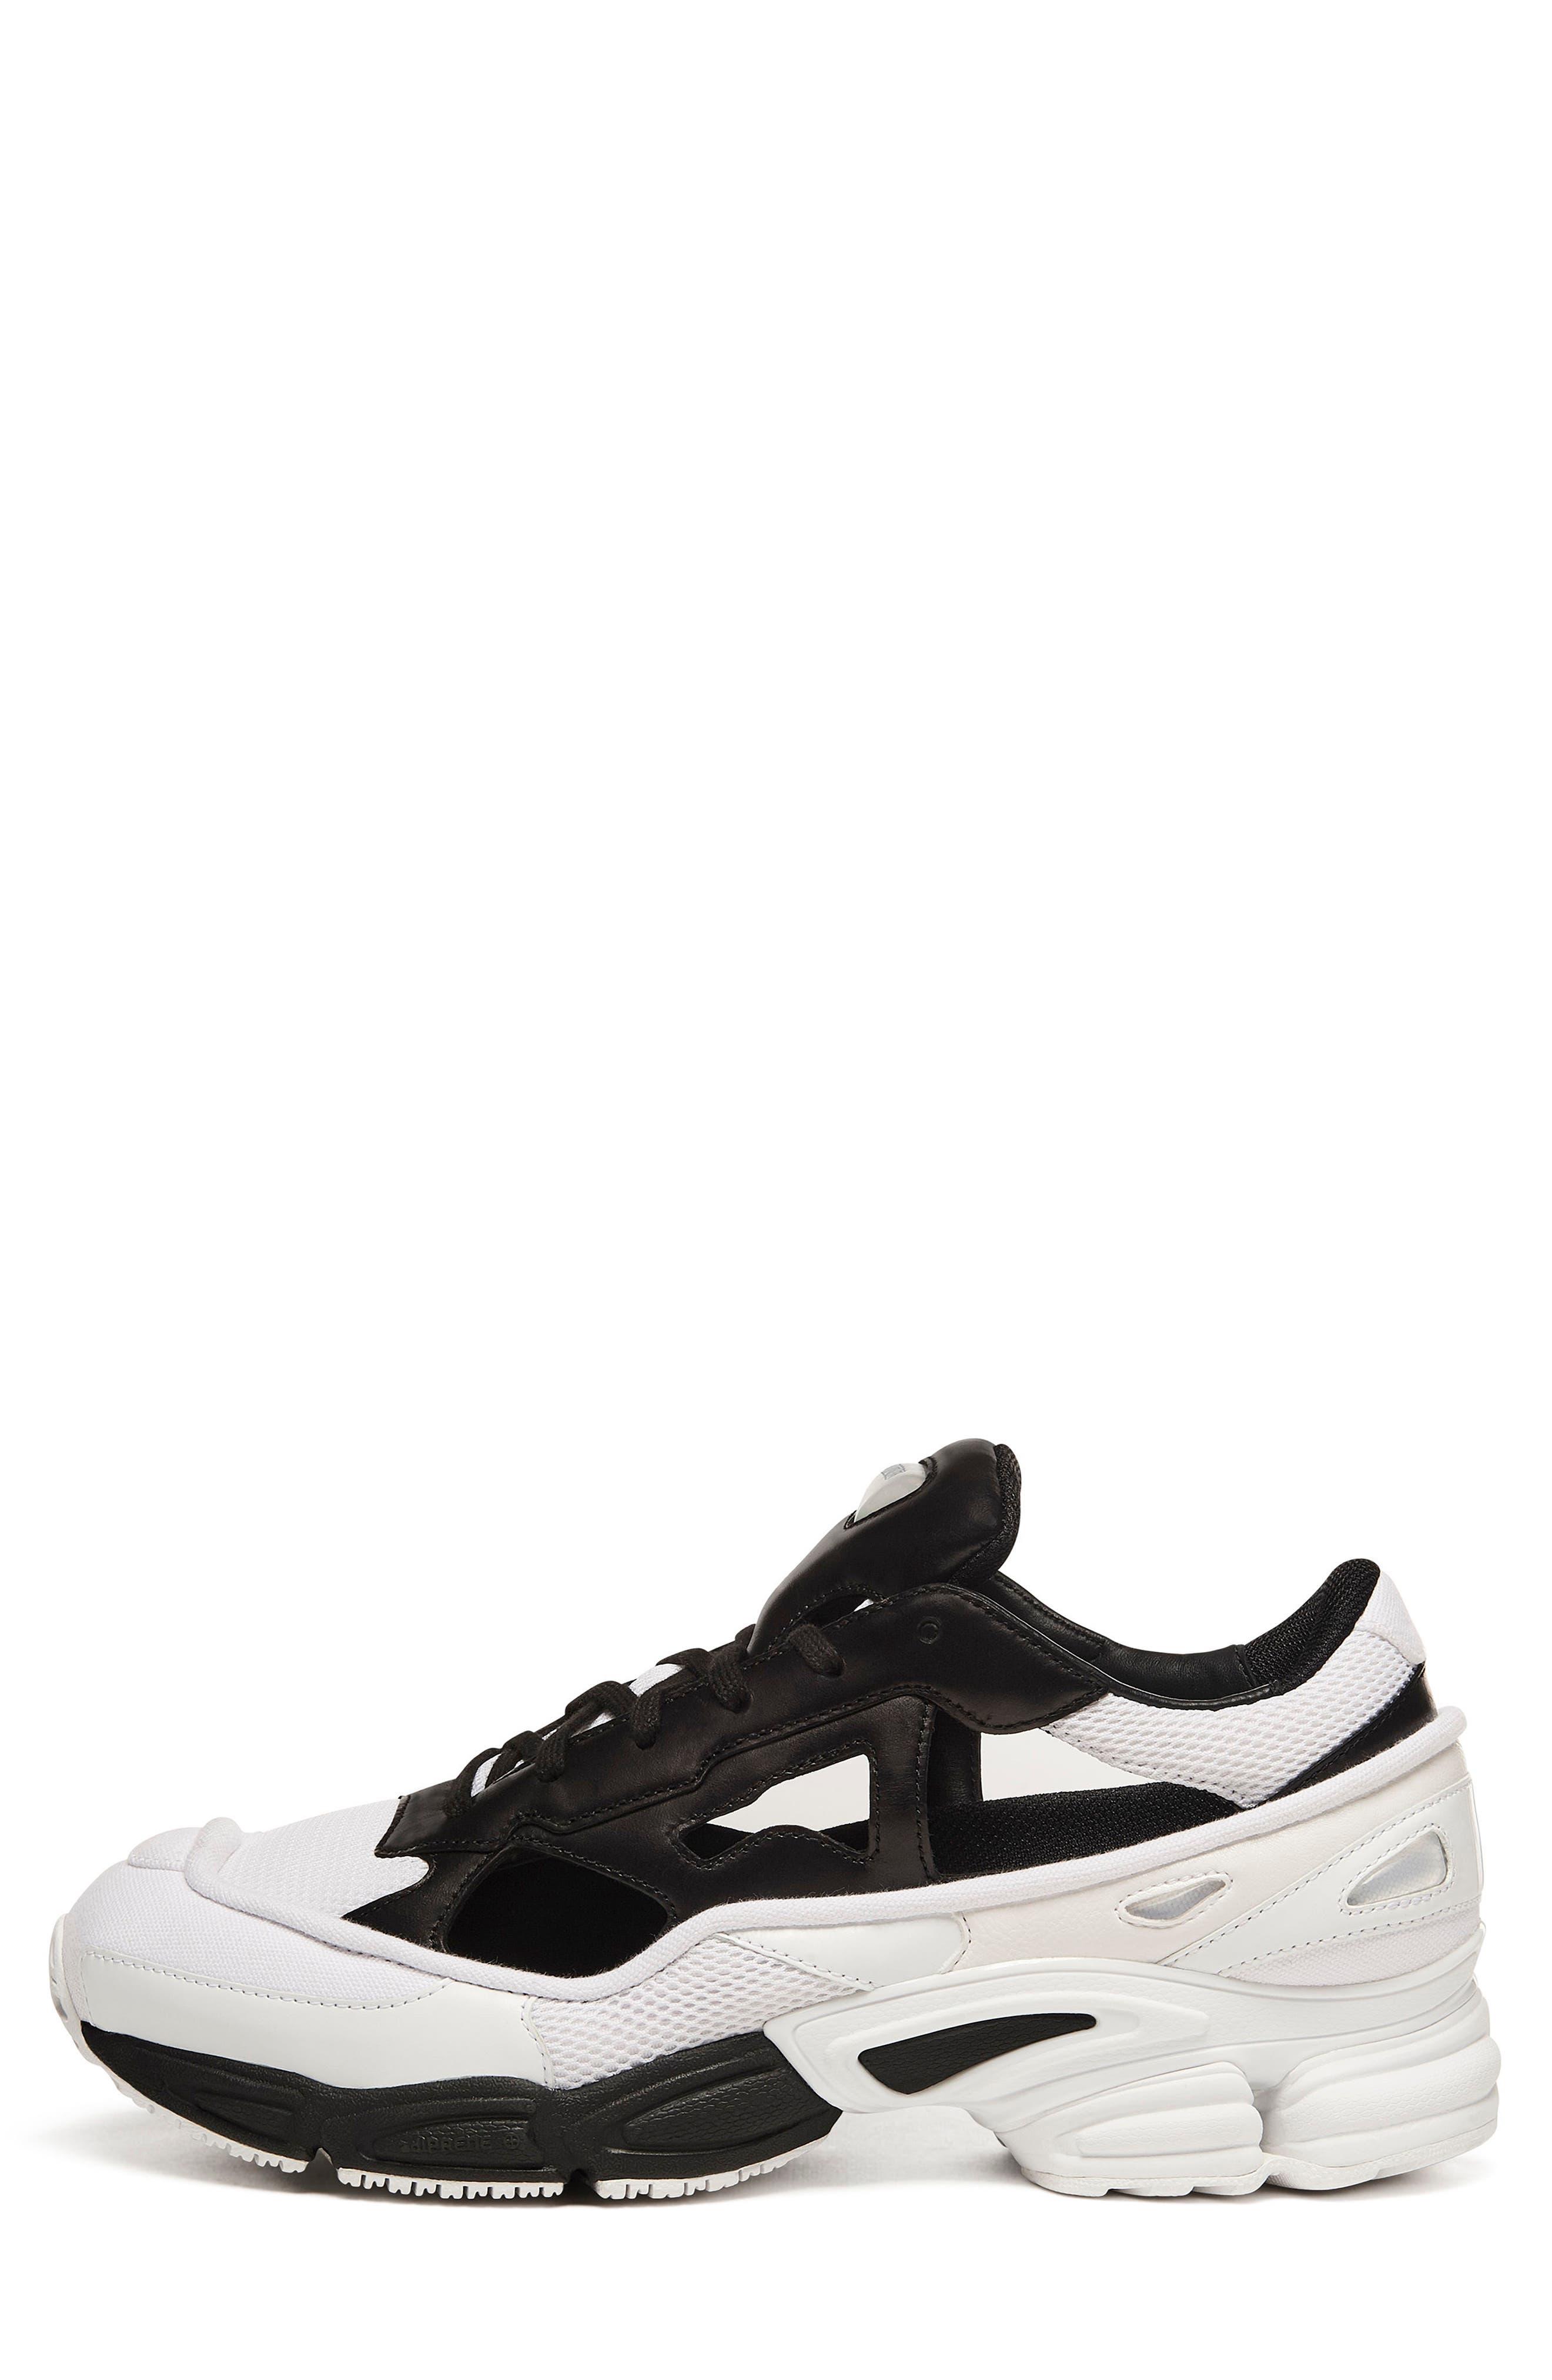 adidas x Raf Simons Replicant Ozweego Sneaker,                         Main,                         color, Core Black/ Cream White/ White